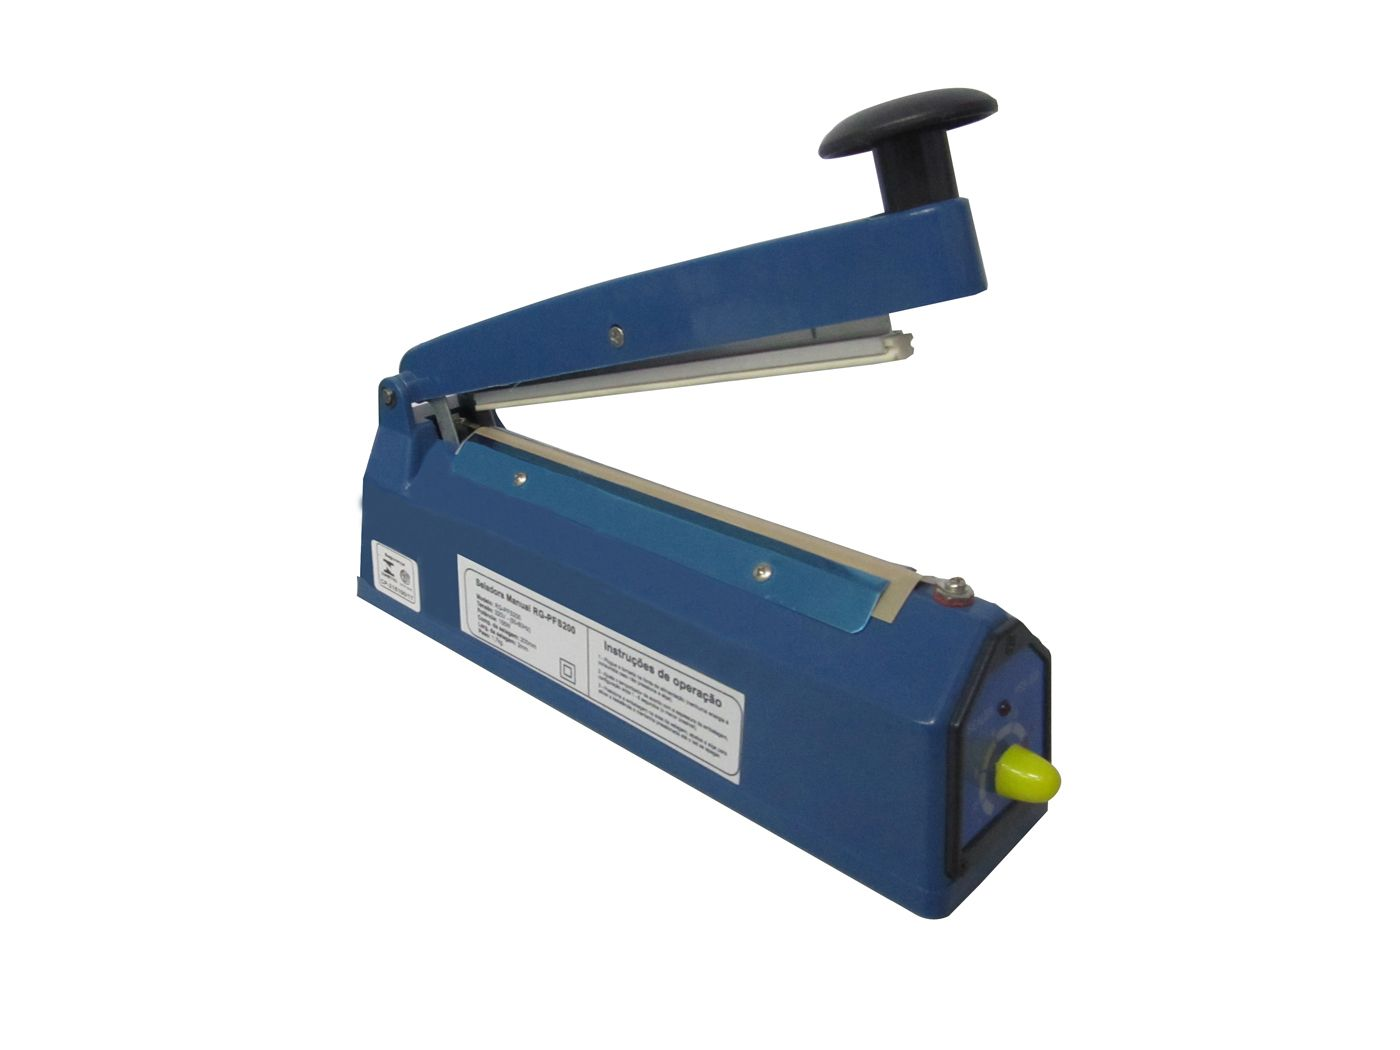 Seladora Manual RG-PFS200 - 220V